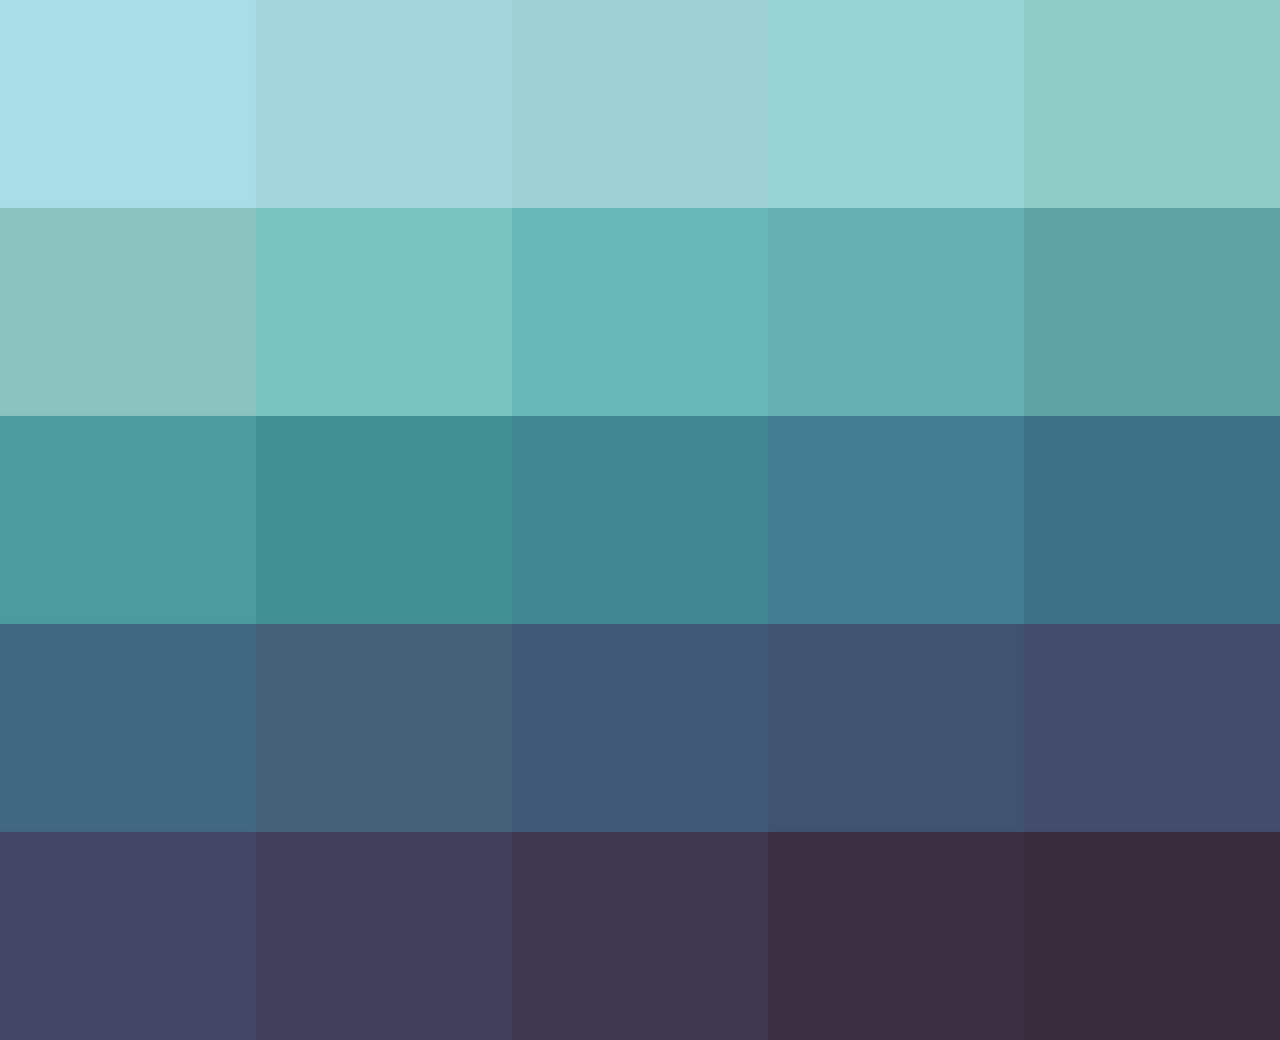 Deep sea palette by hoecrux on deviantart for Deep grey color